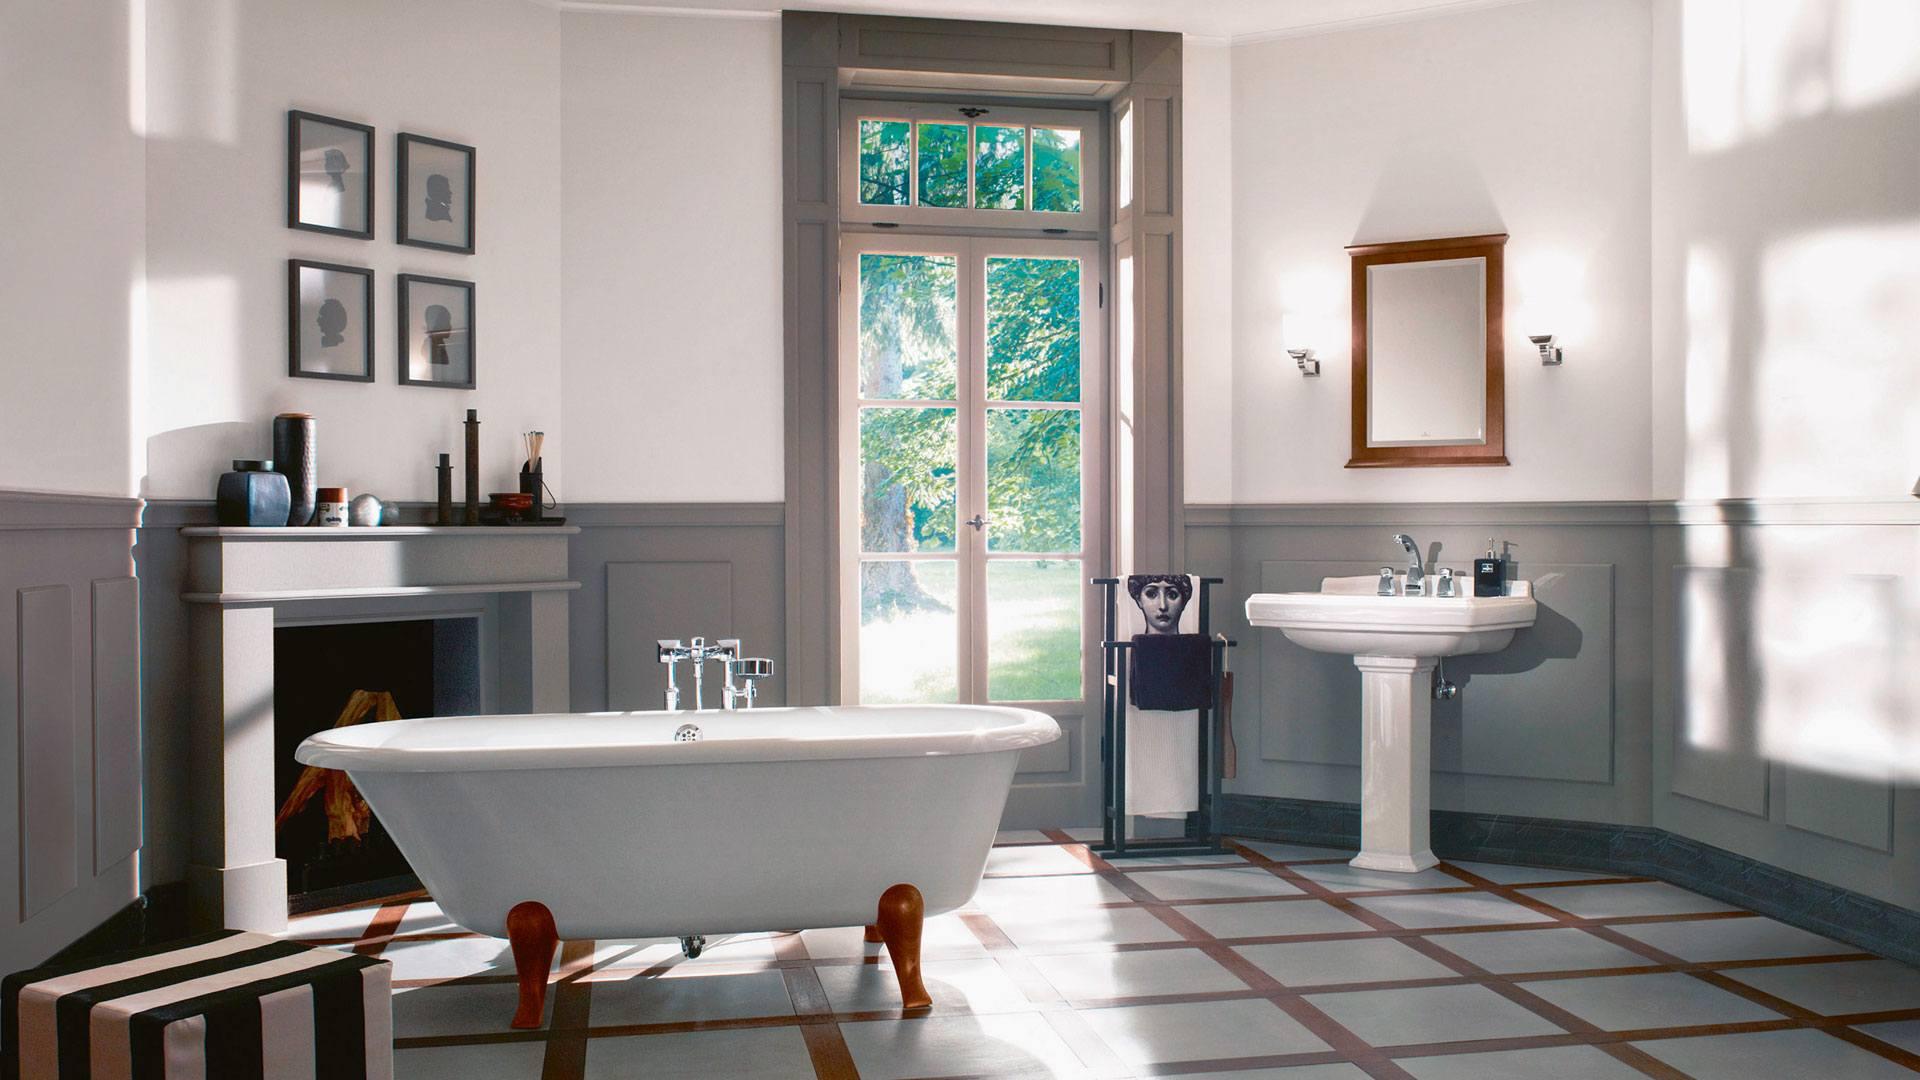 badezimmer bedeutung inspiration f r die gestaltung der besten r ume. Black Bedroom Furniture Sets. Home Design Ideas